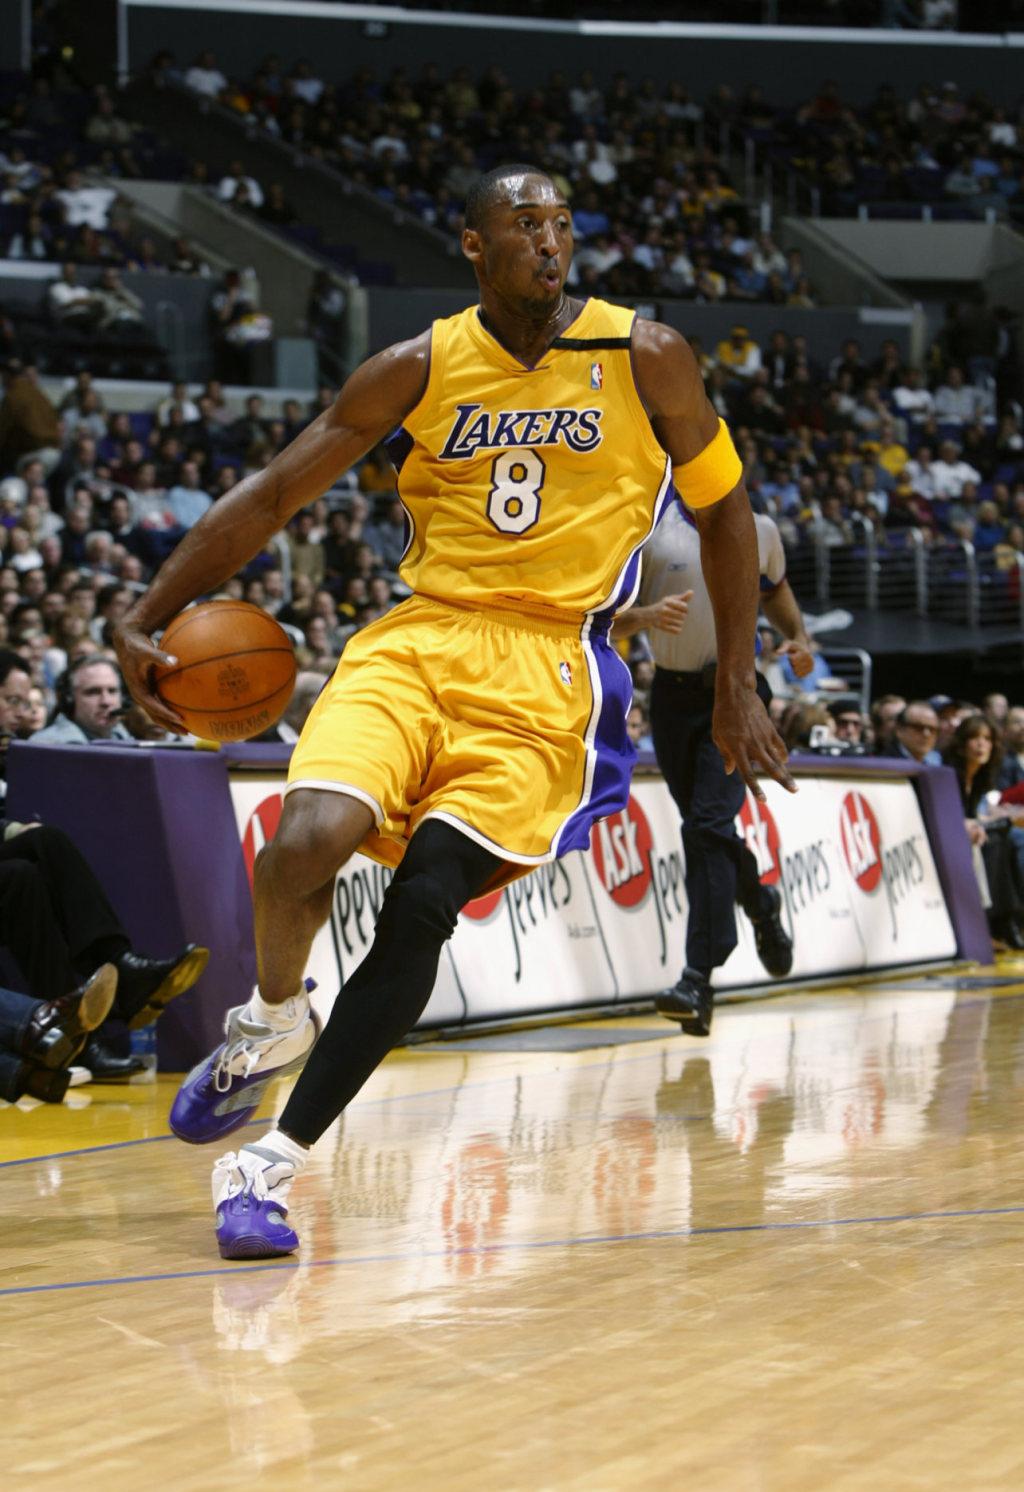 Kobe Bryant Playing in Reebok Iversons